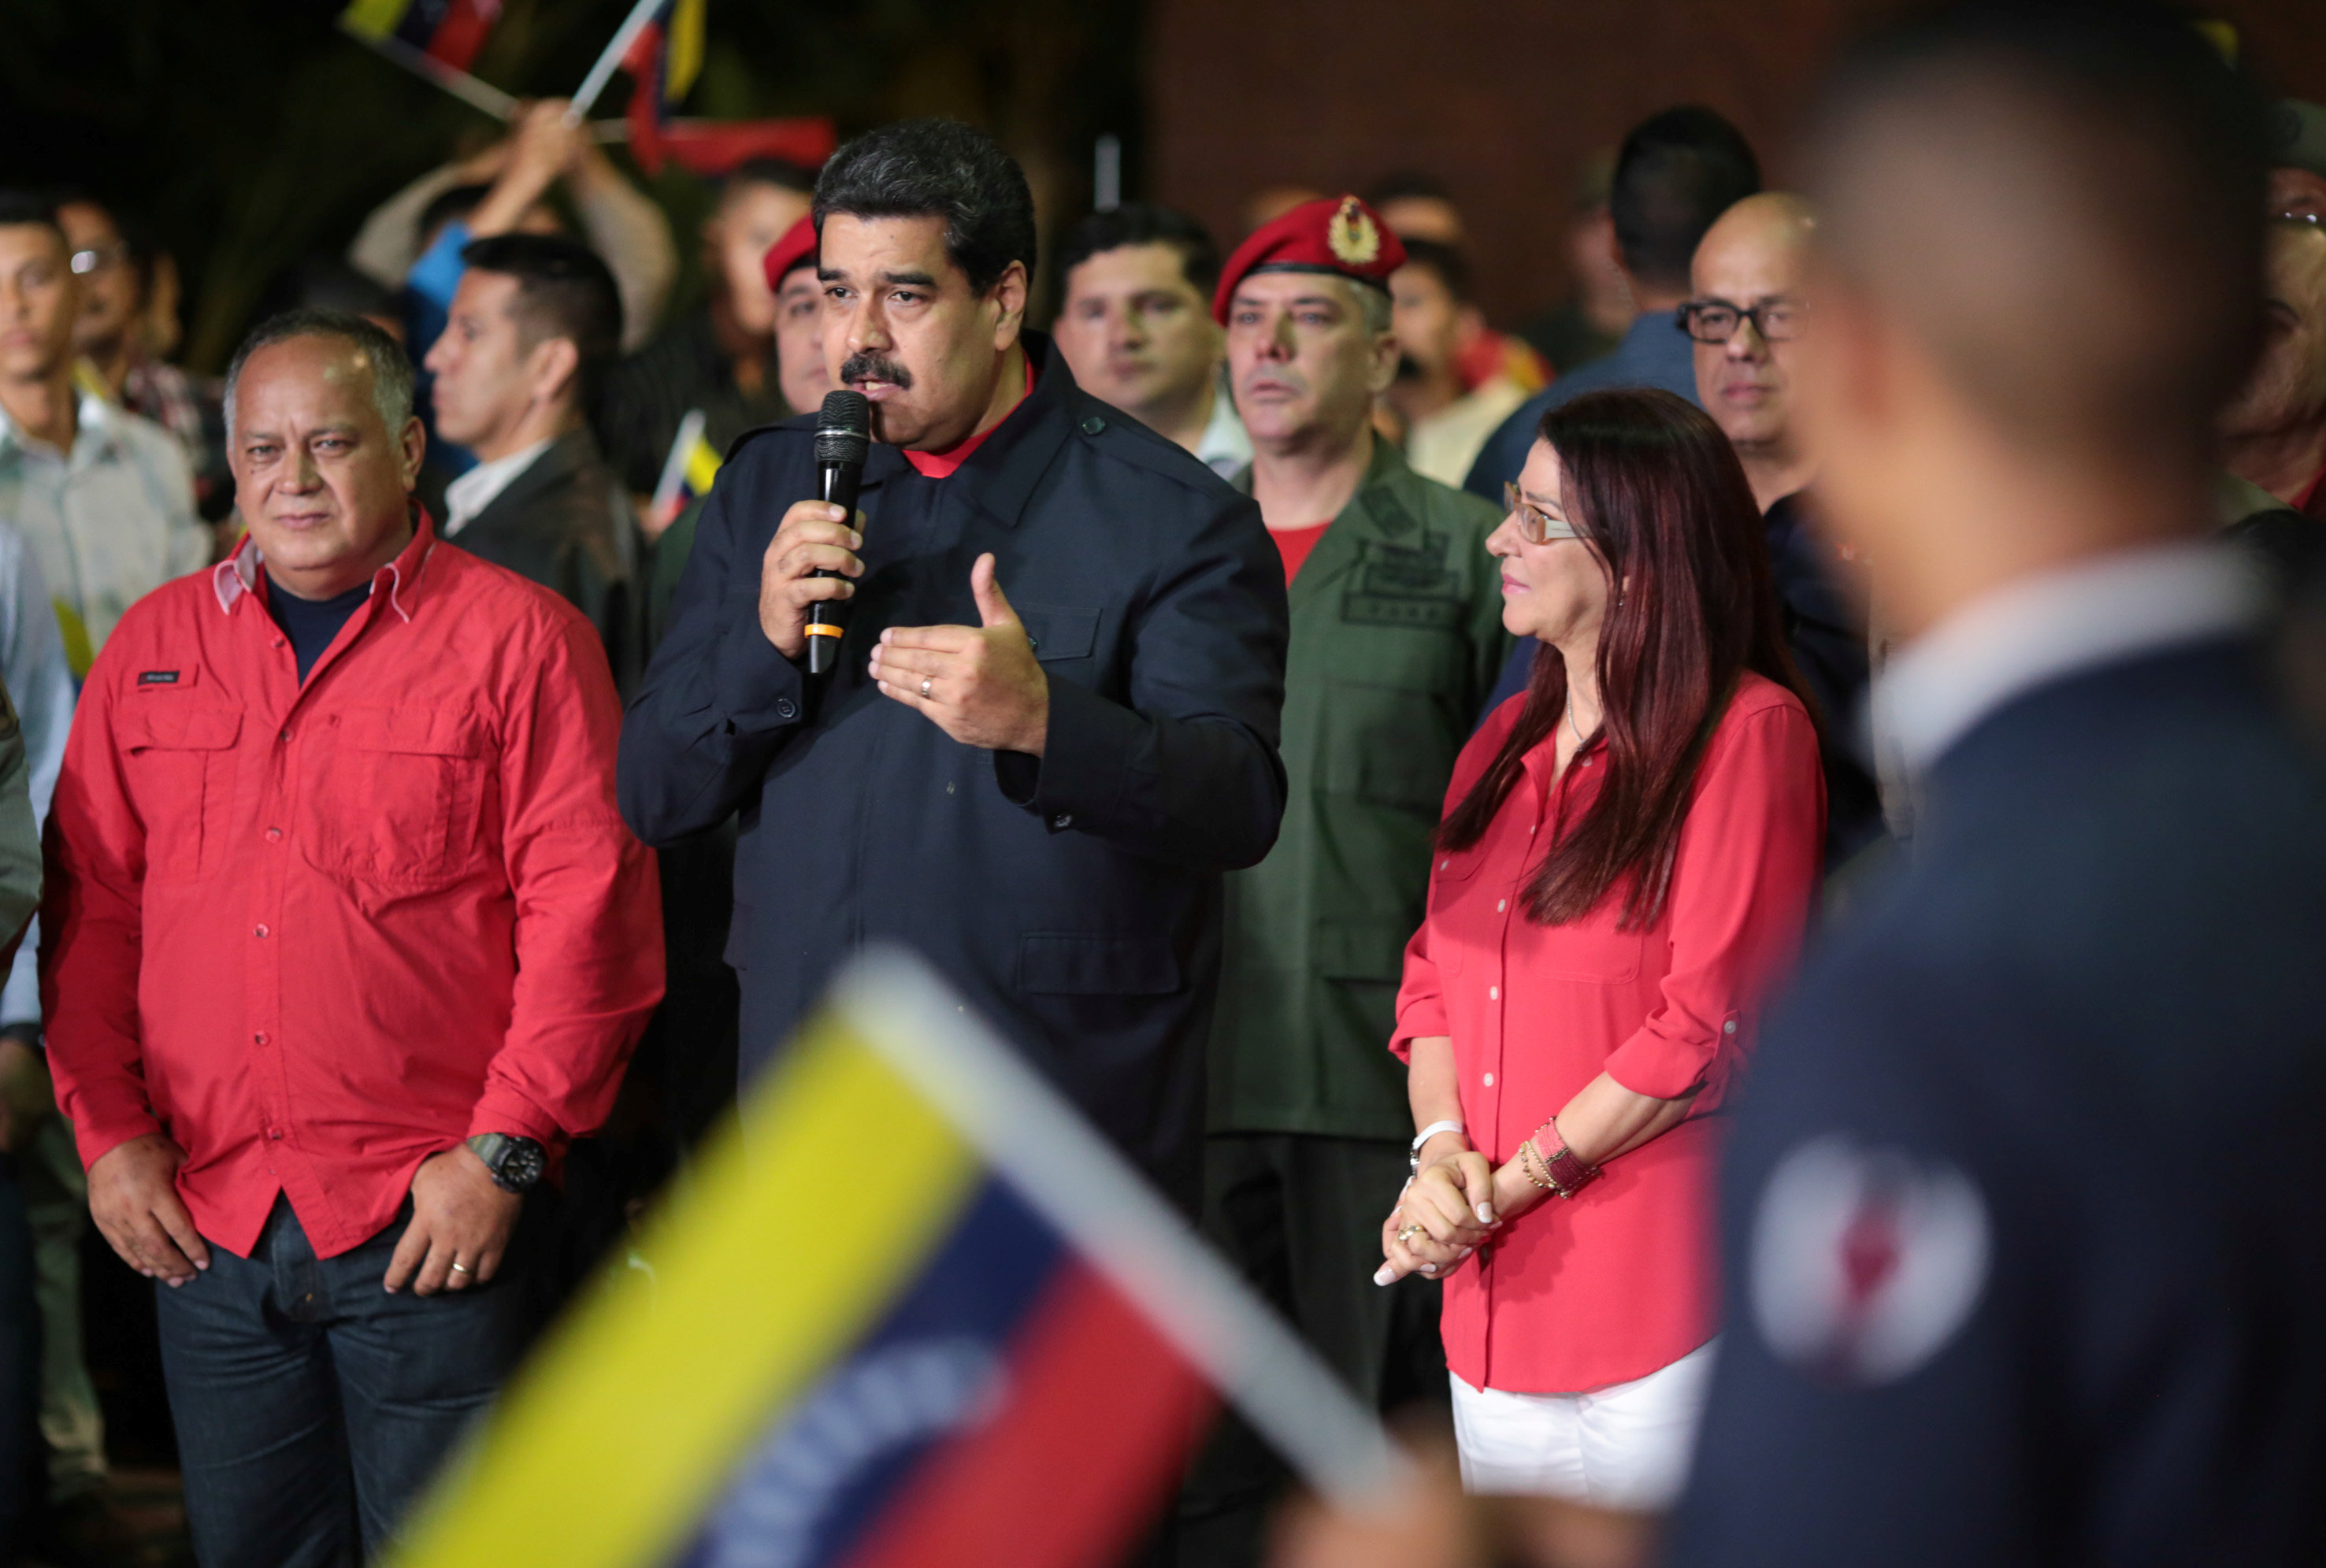 2017 10 16T044441Z 288966141 RC1CA19493E0 RTRMADP 3 VENEZUELA ELECTION